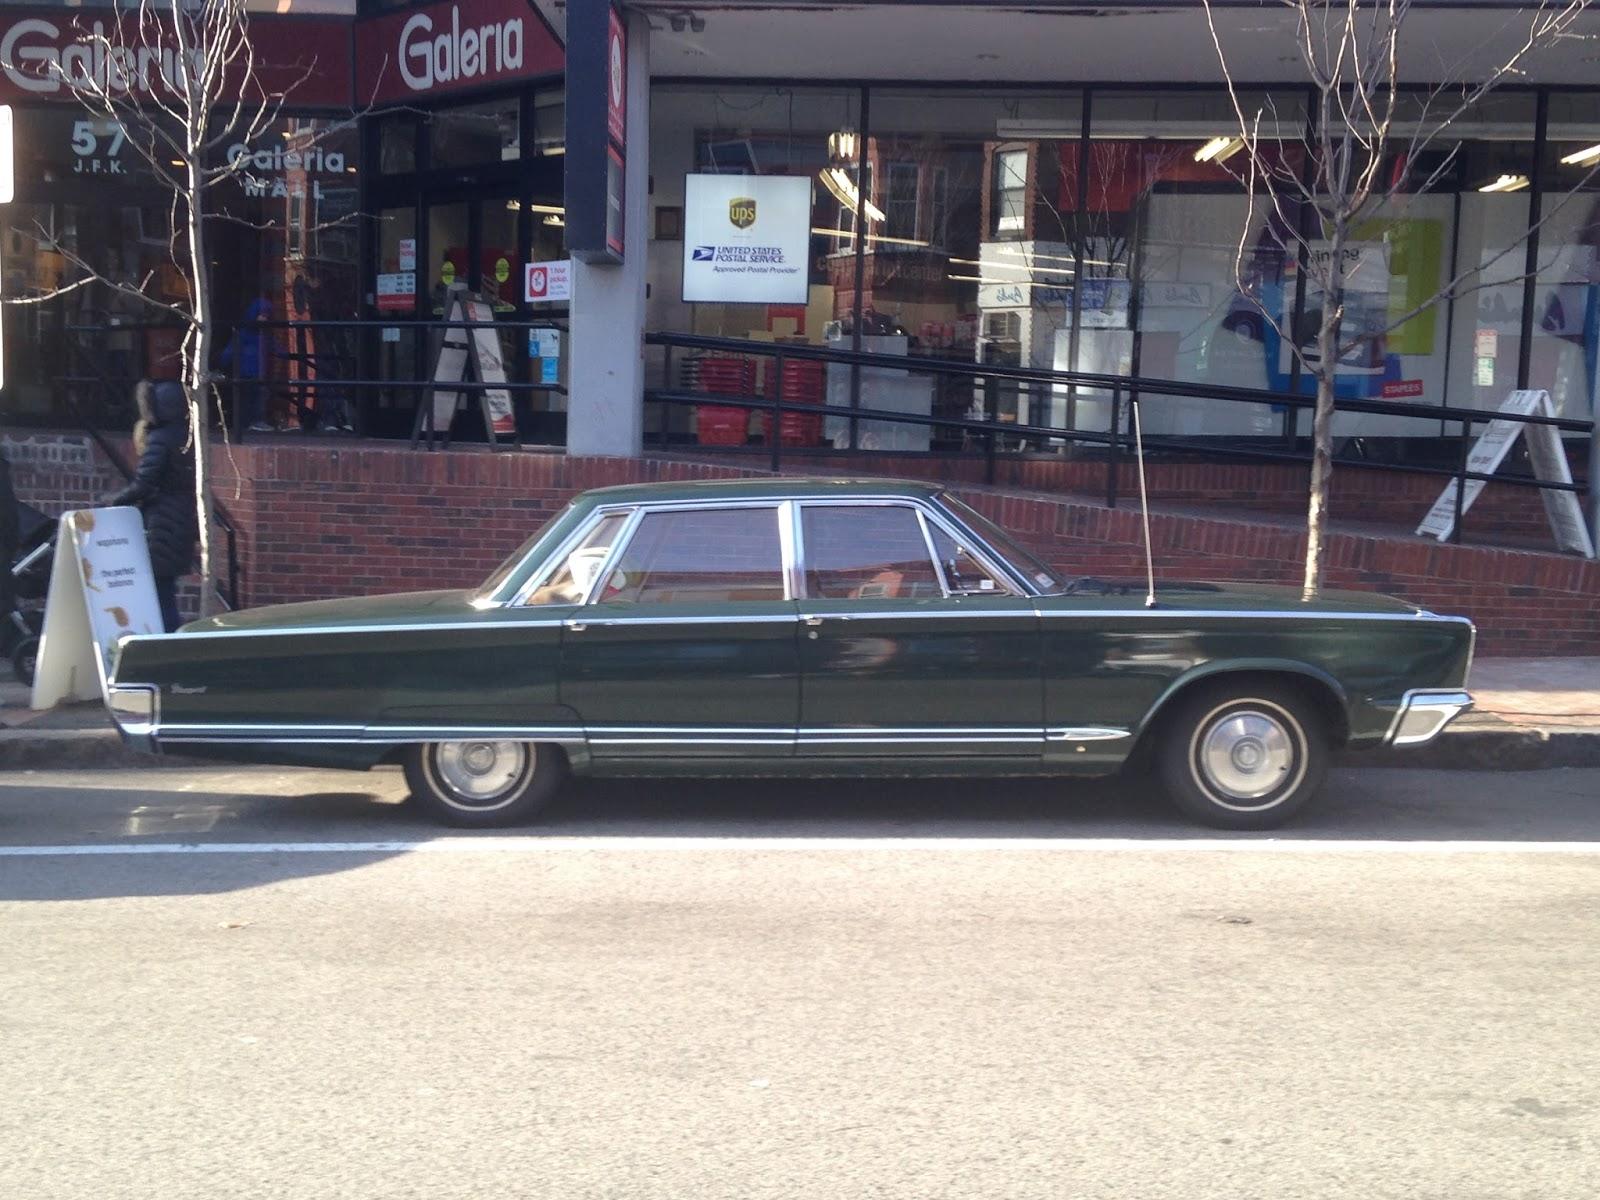 Autoliterate 1966 Chrysler Newport Harvard Square